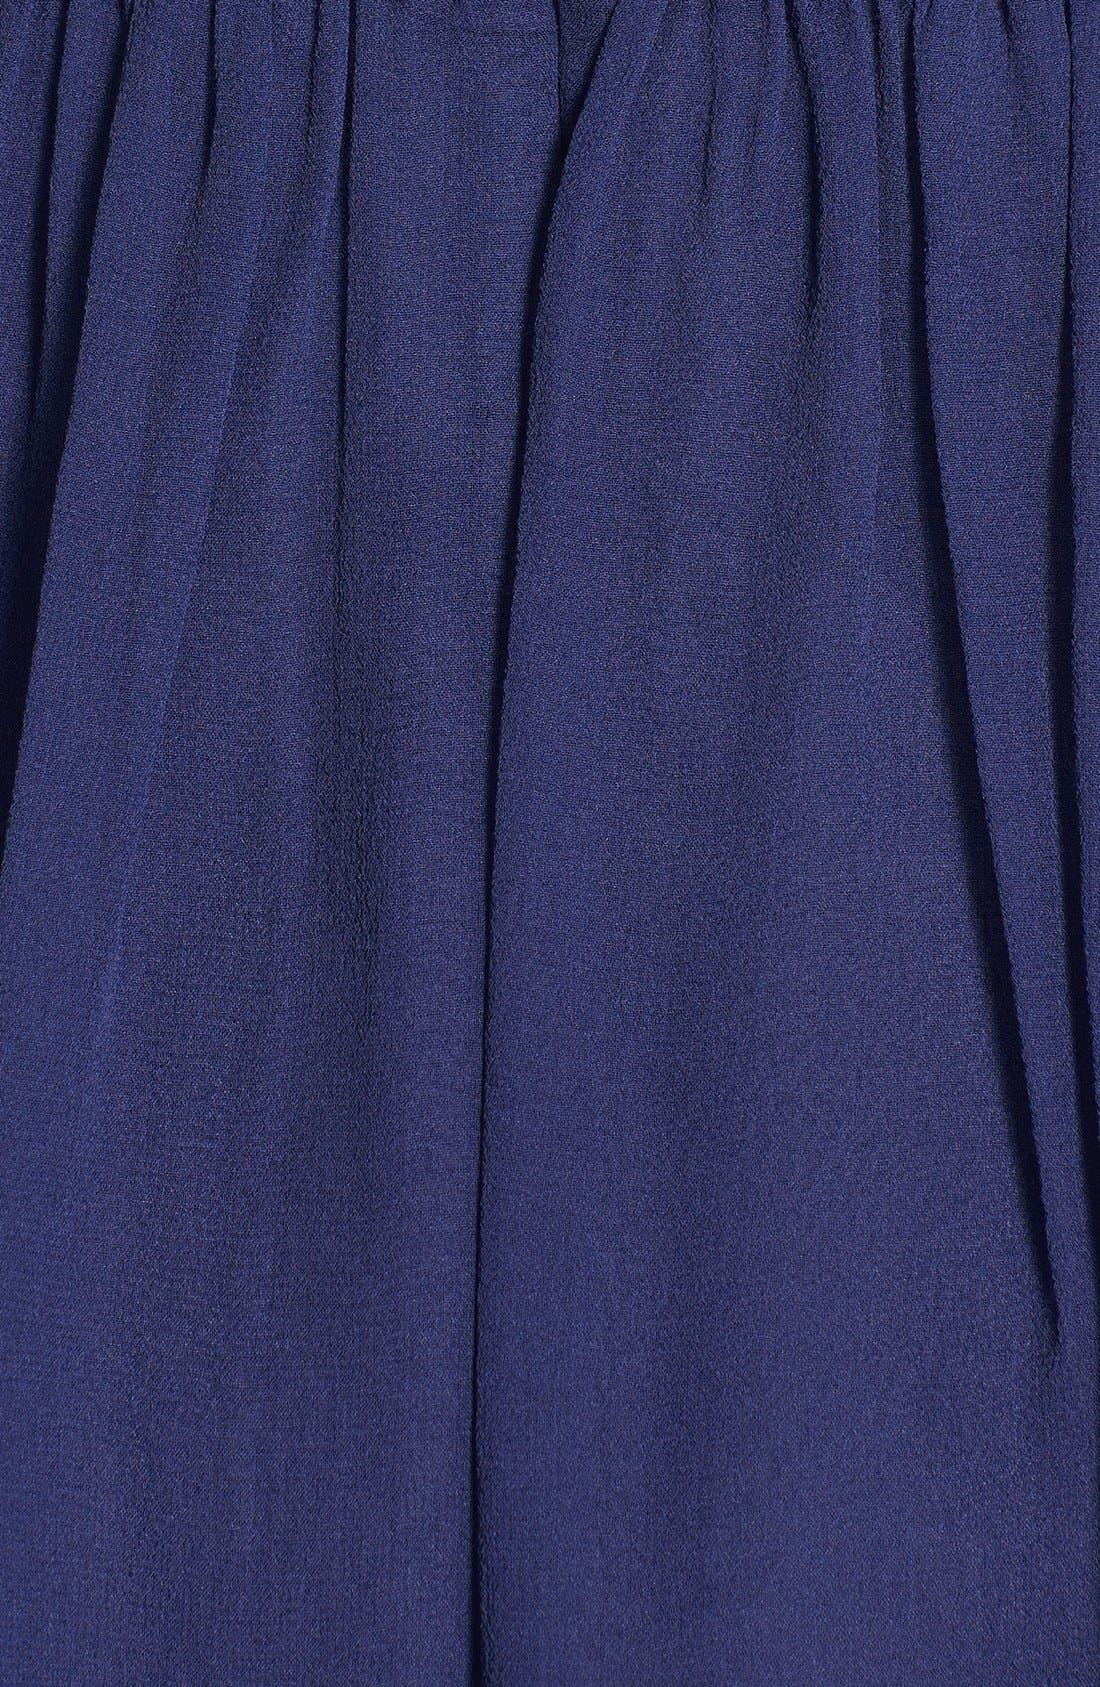 'Morgan' Strapless Silk Chiffon Dress,                             Alternate thumbnail 83, color,